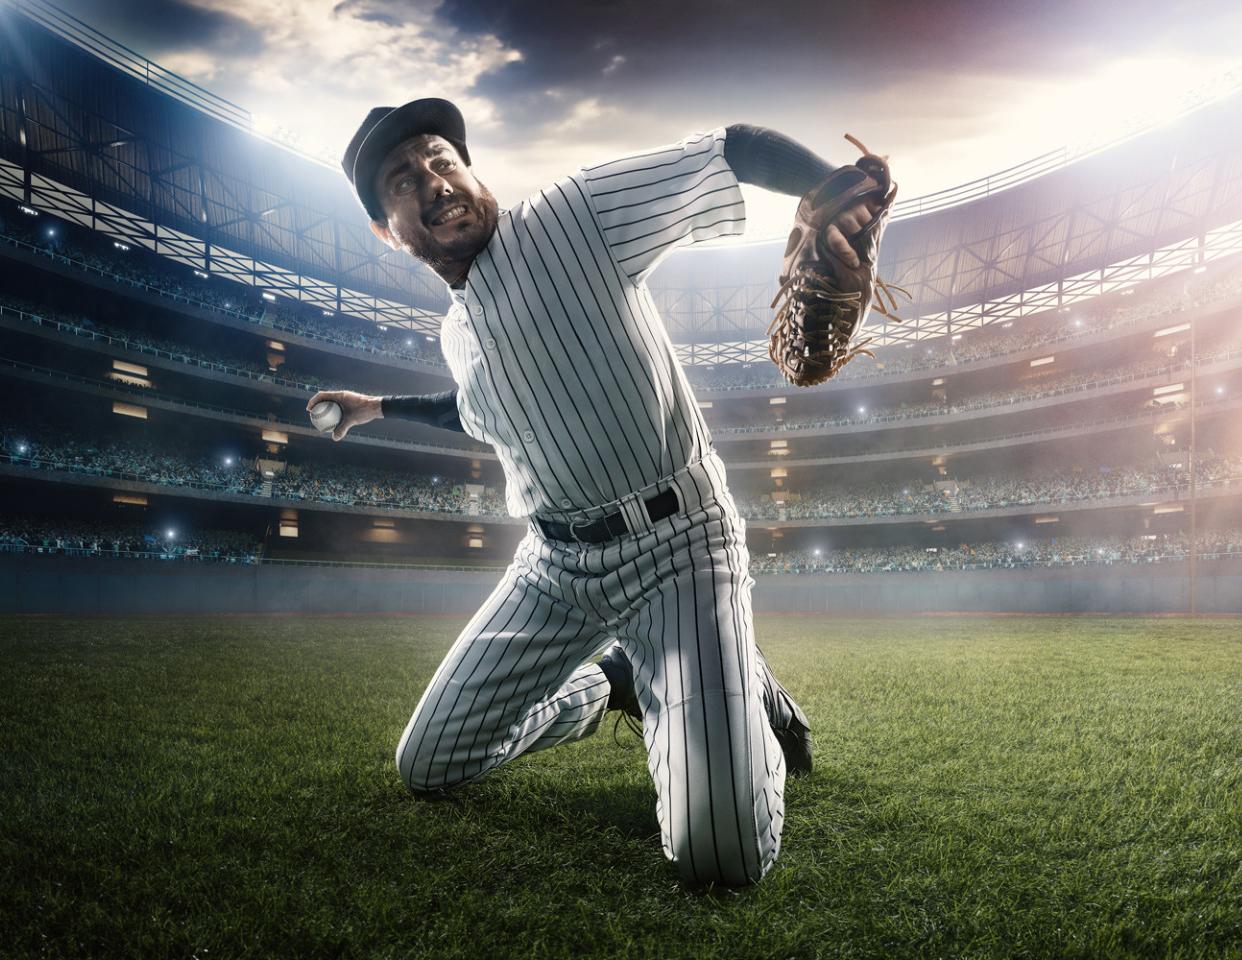 !123_03_2016_baseball_game_004-1920x960